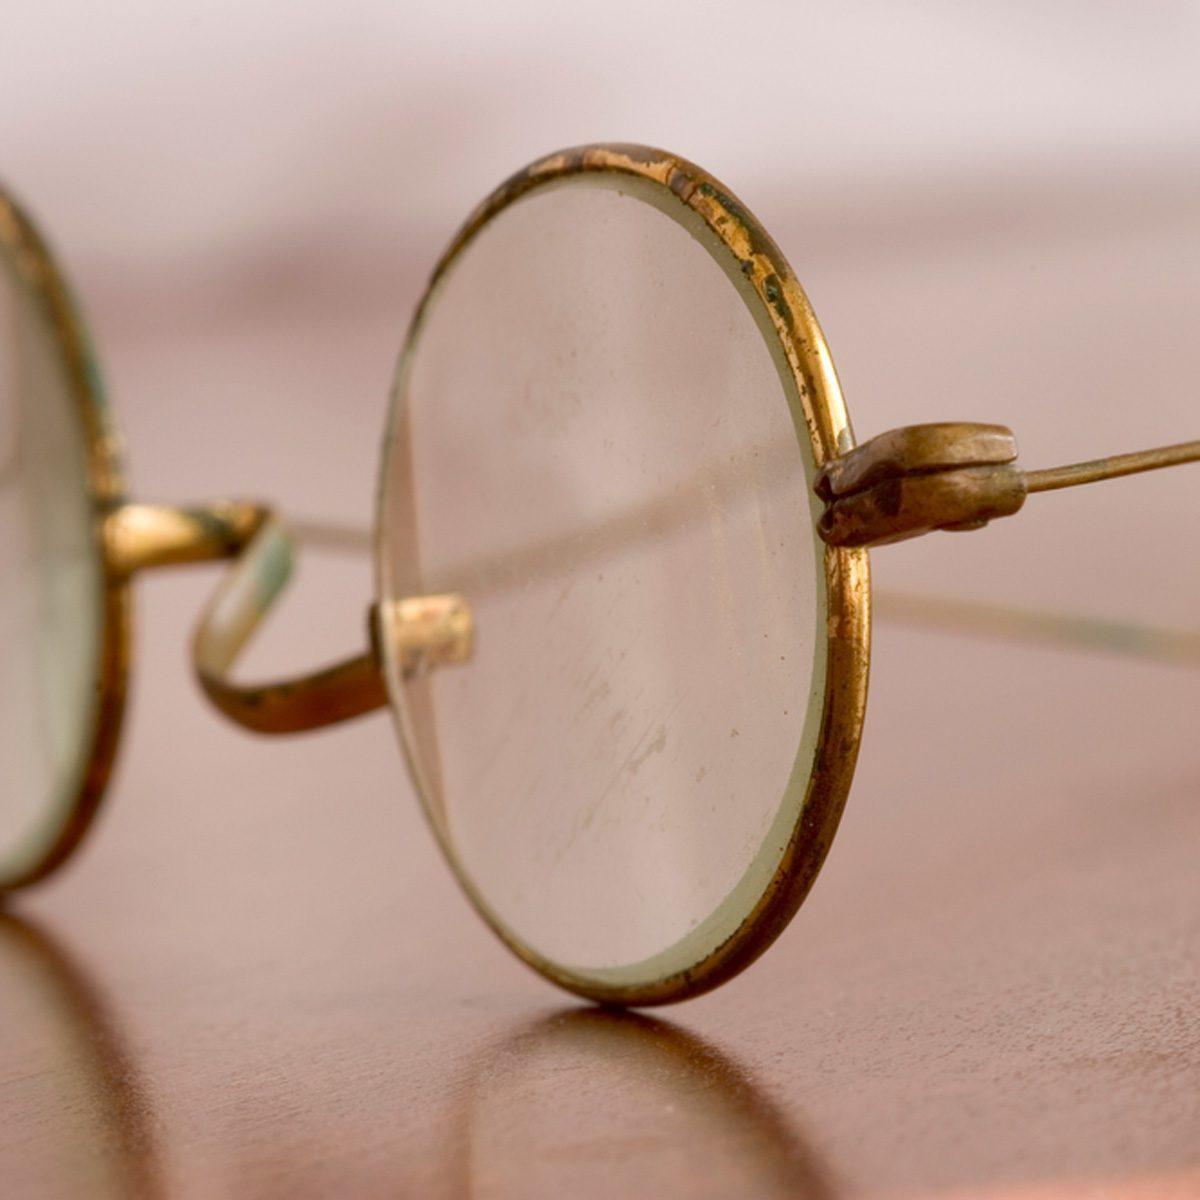 vintage eyeglasses close up